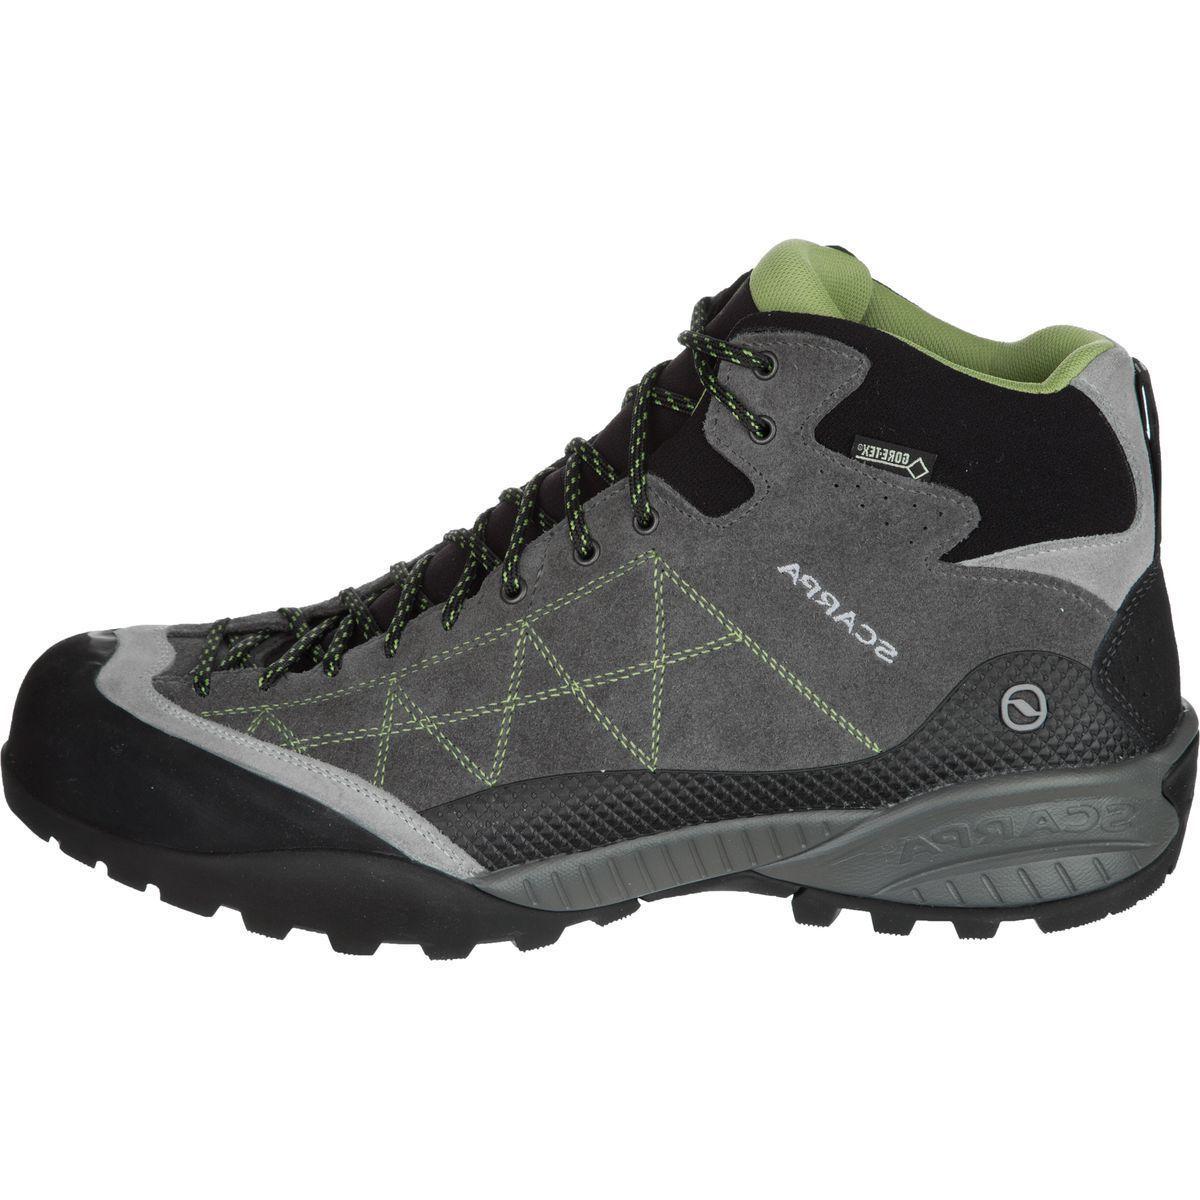 Scarpa Zen Pro Mid GTX Shoe - Men's